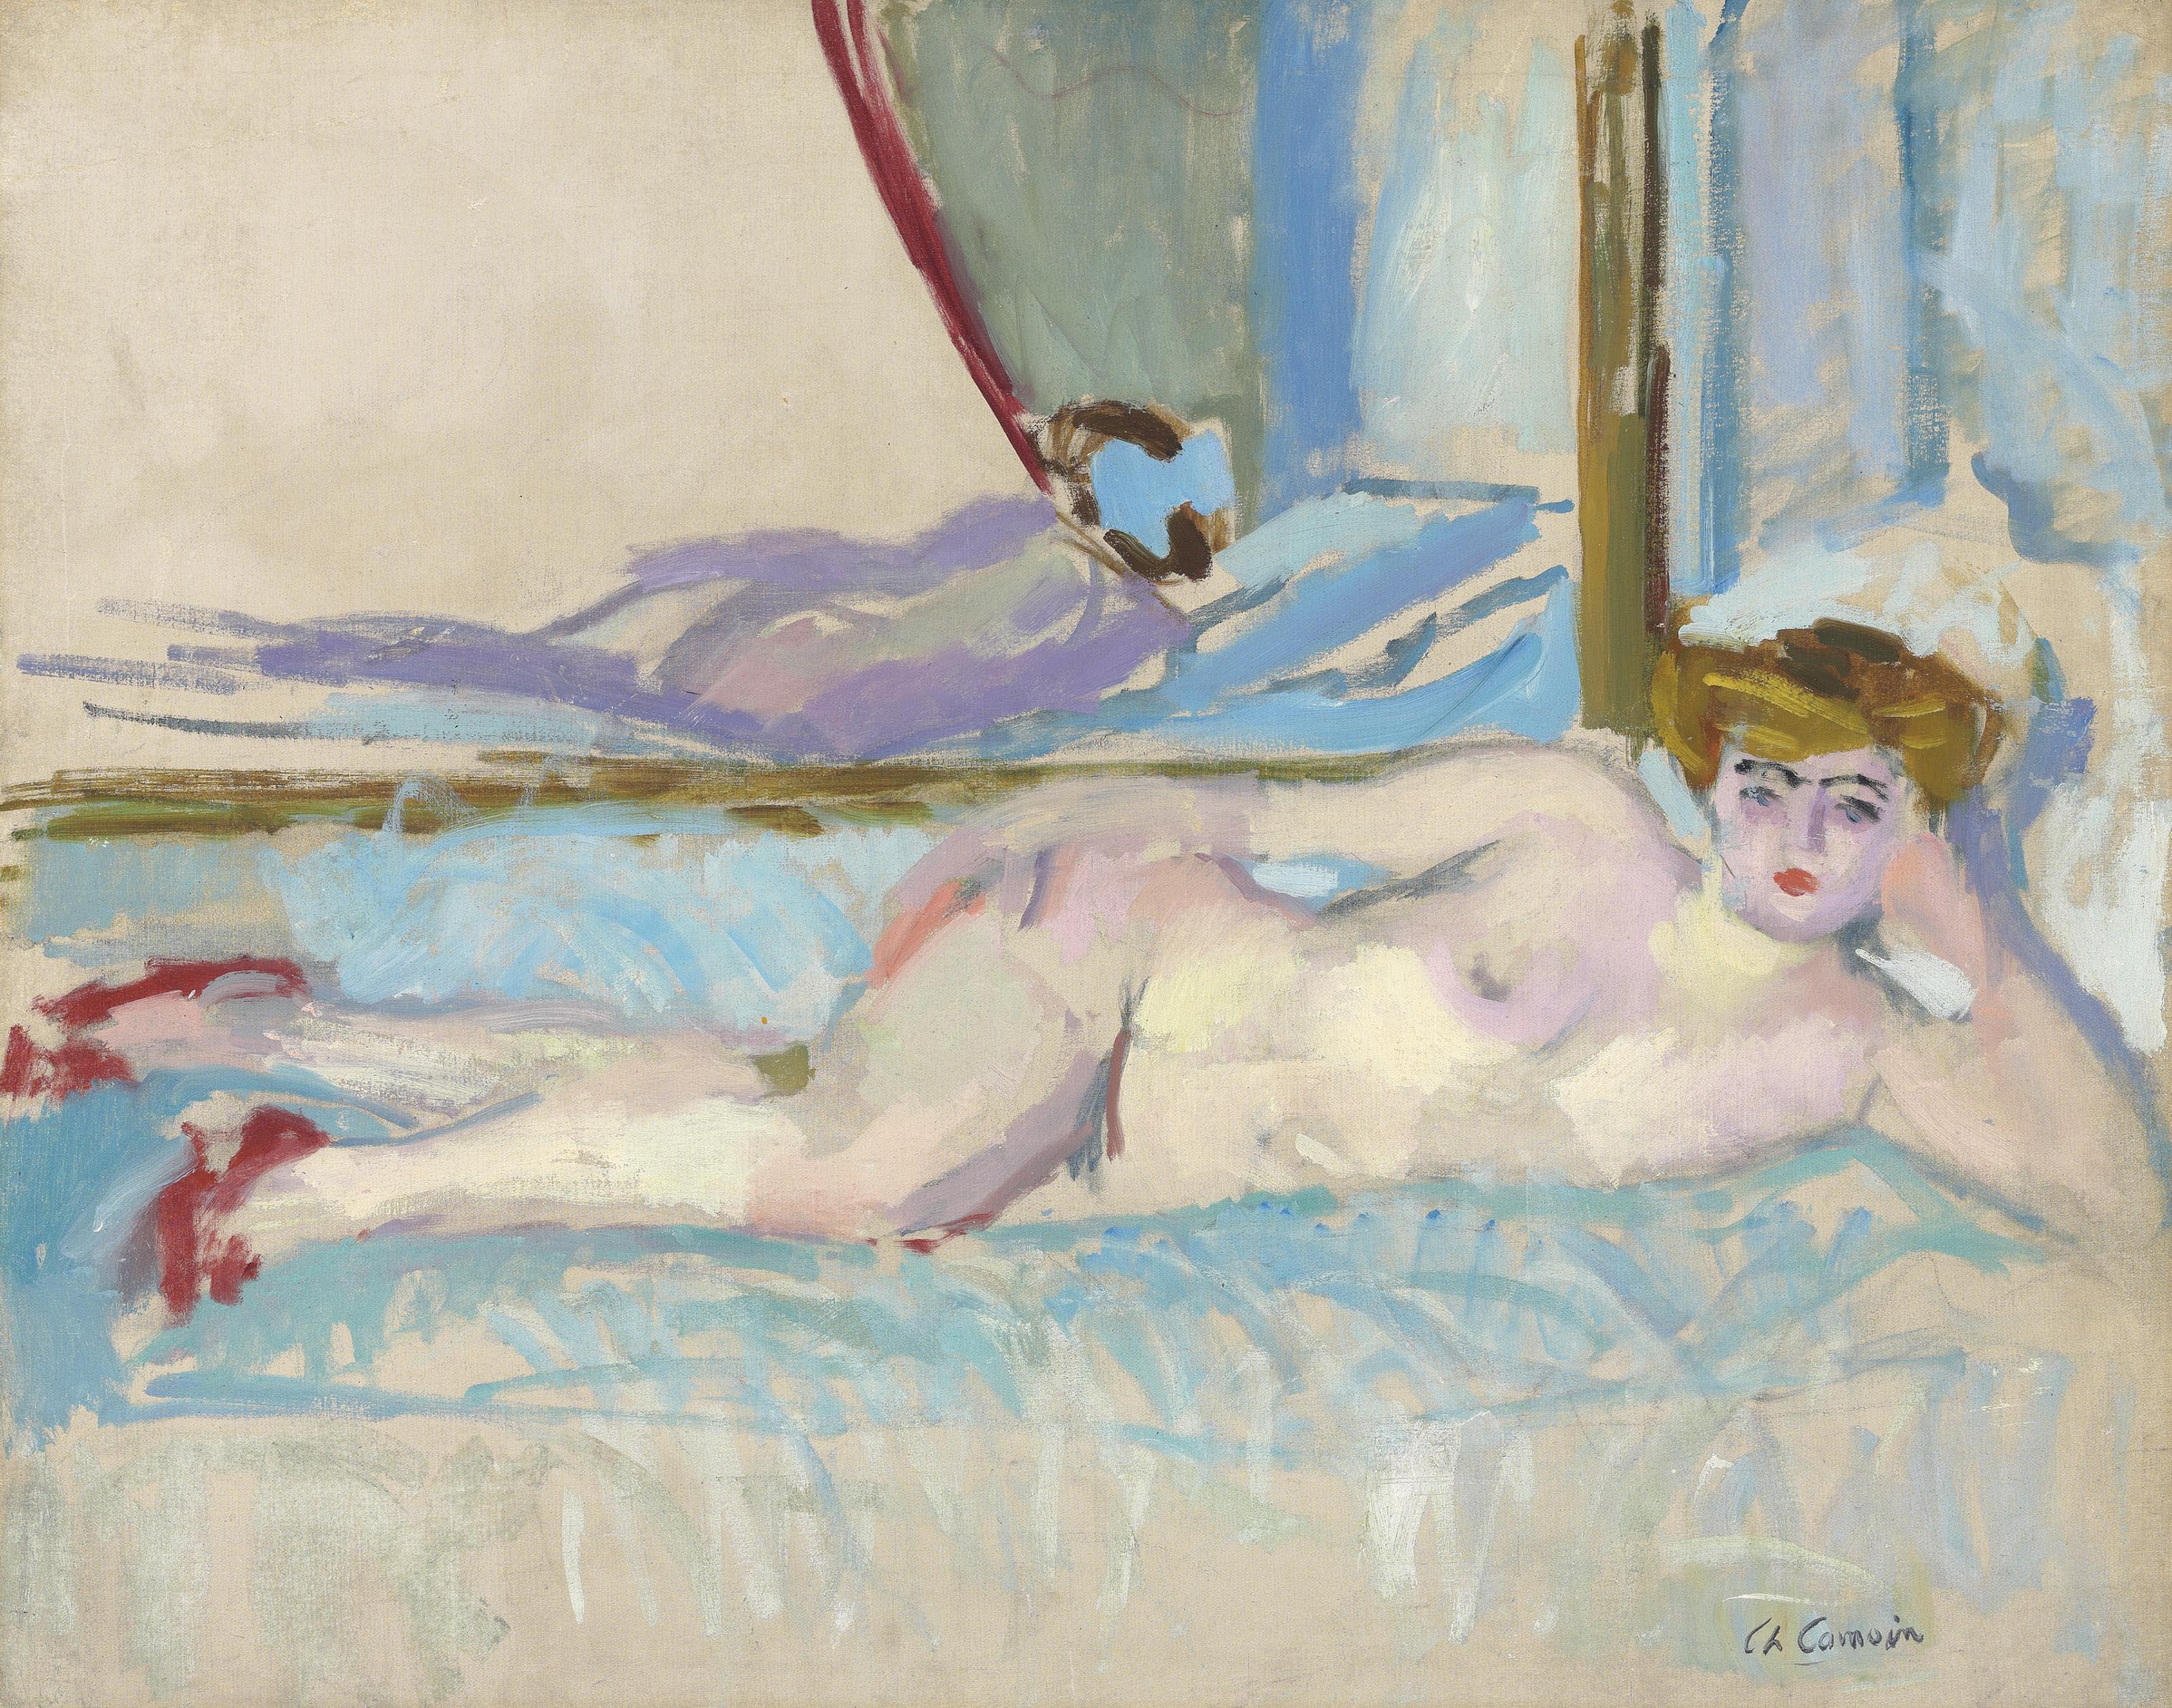 Charles Camoin (1879-1965)